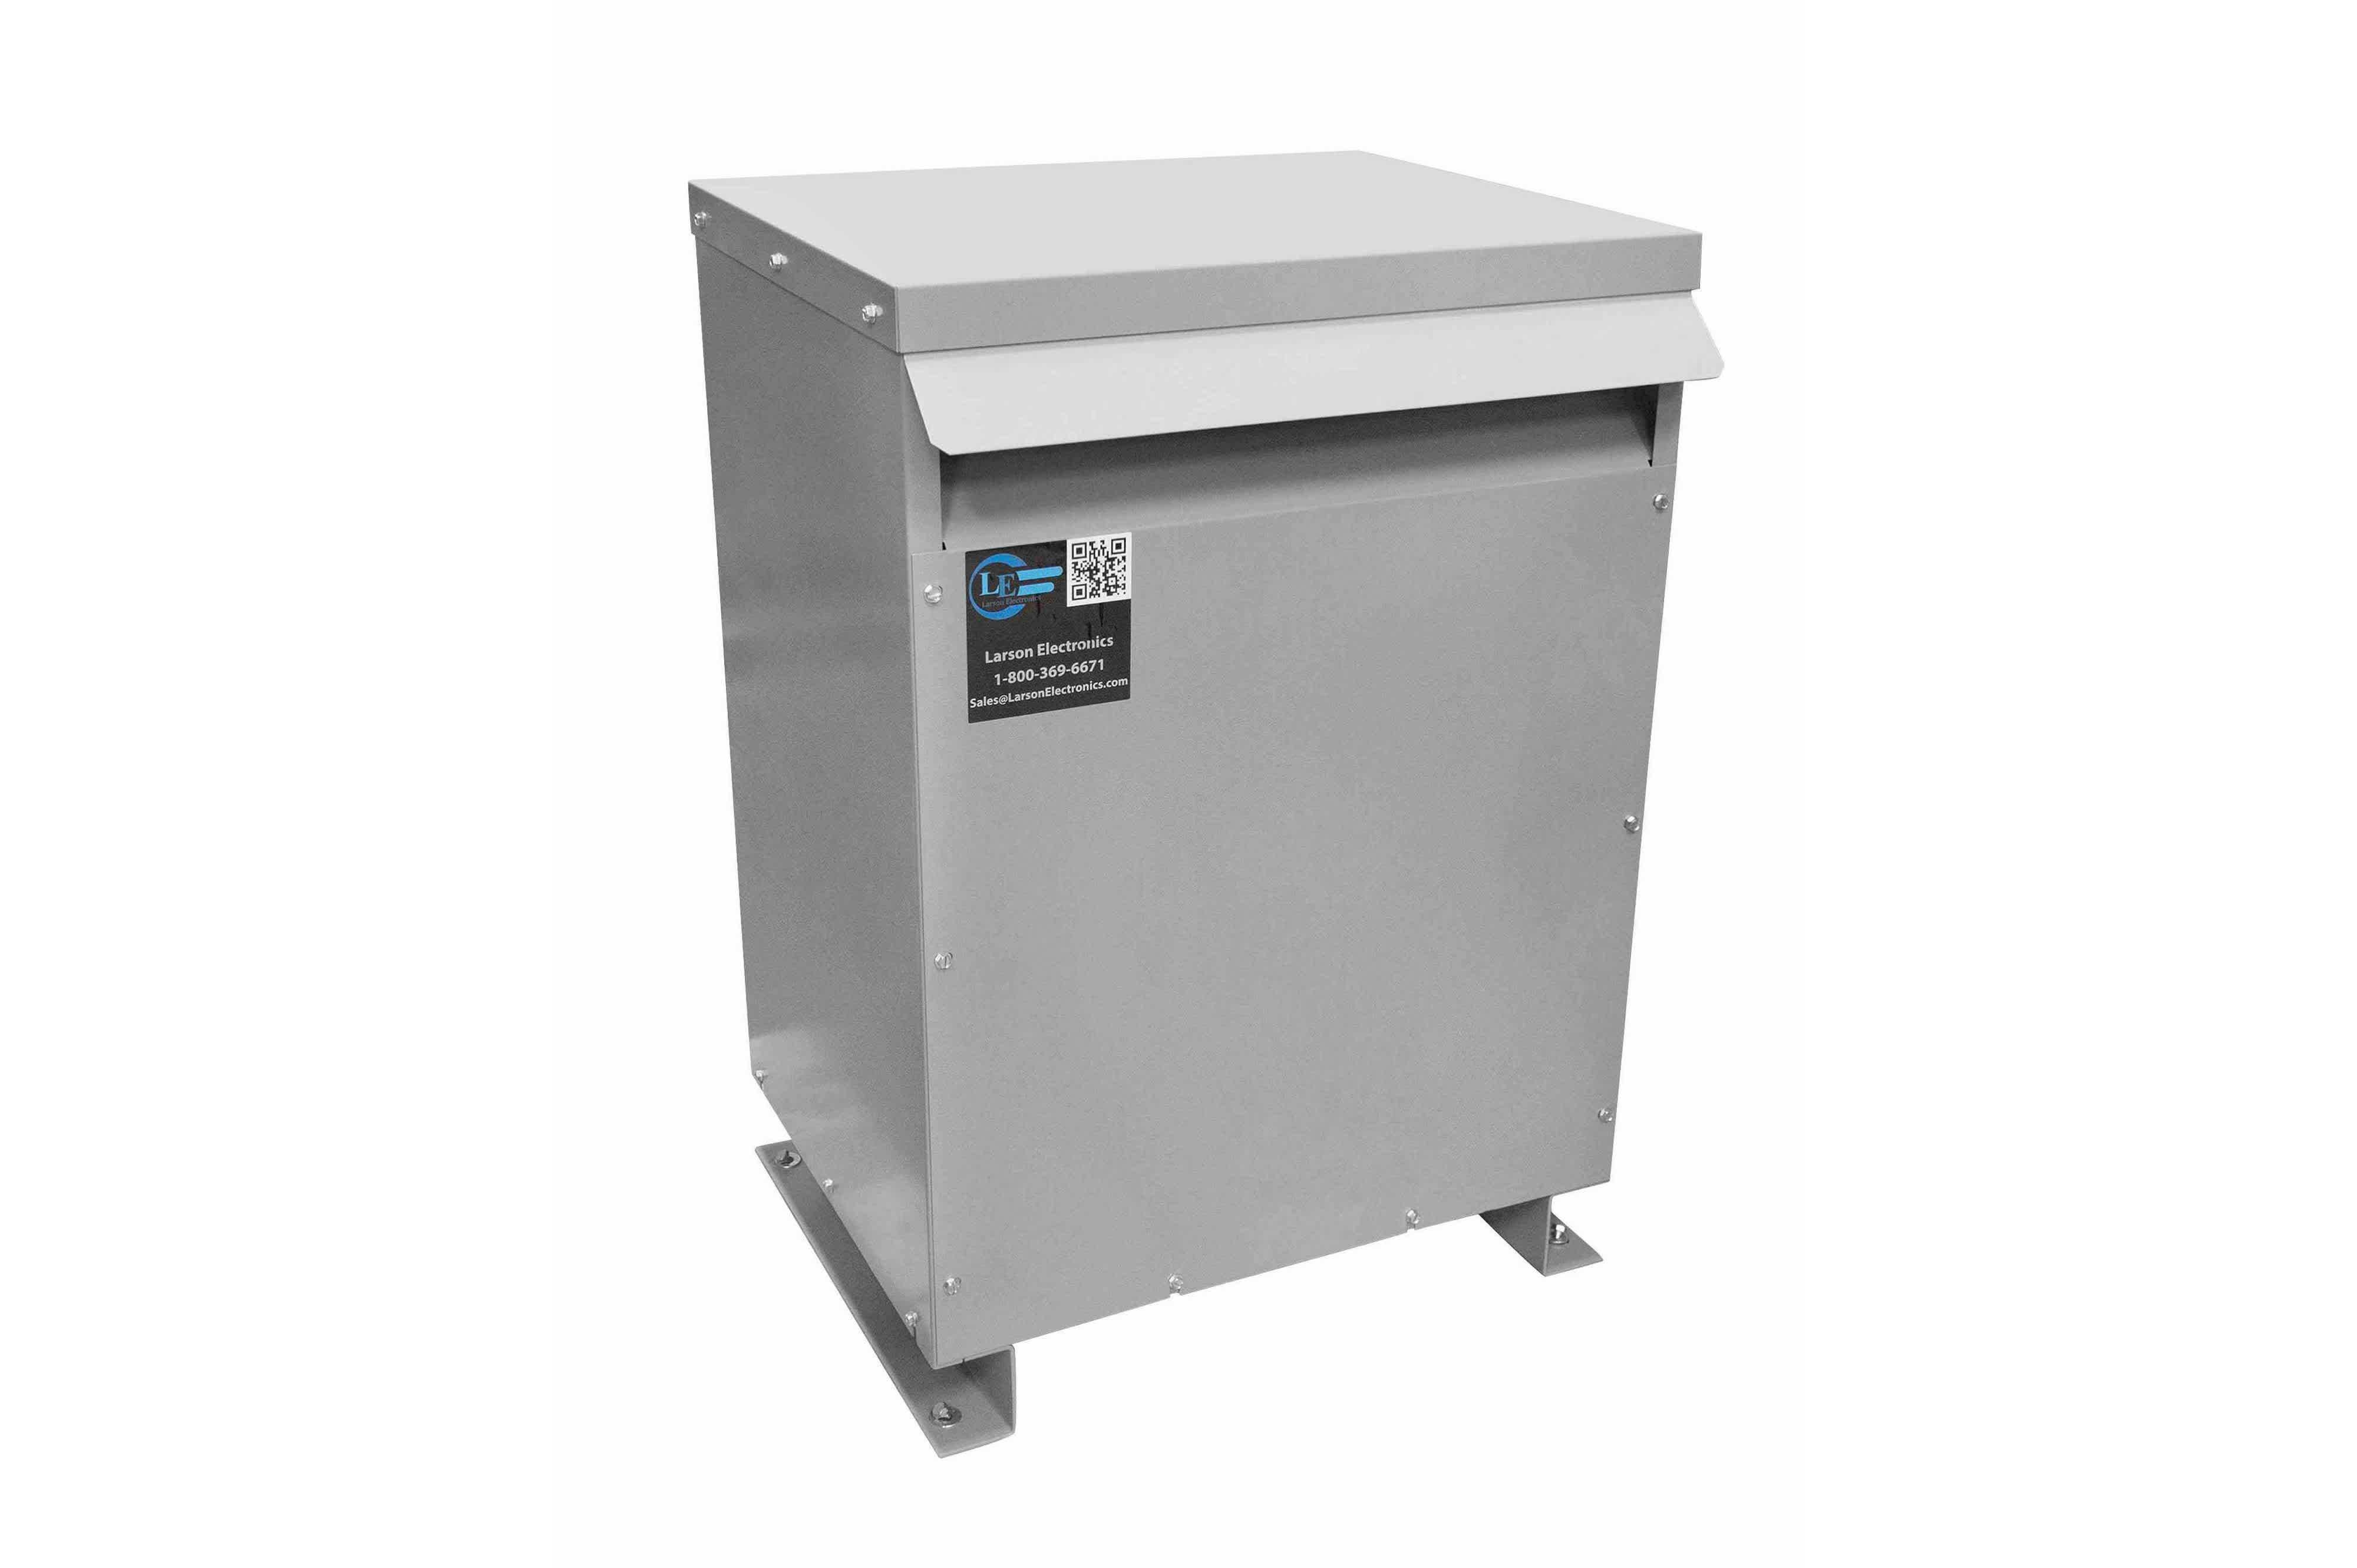 80 kVA 3PH Isolation Transformer, 480V Wye Primary, 600Y/347 Wye-N Secondary, N3R, Ventilated, 60 Hz